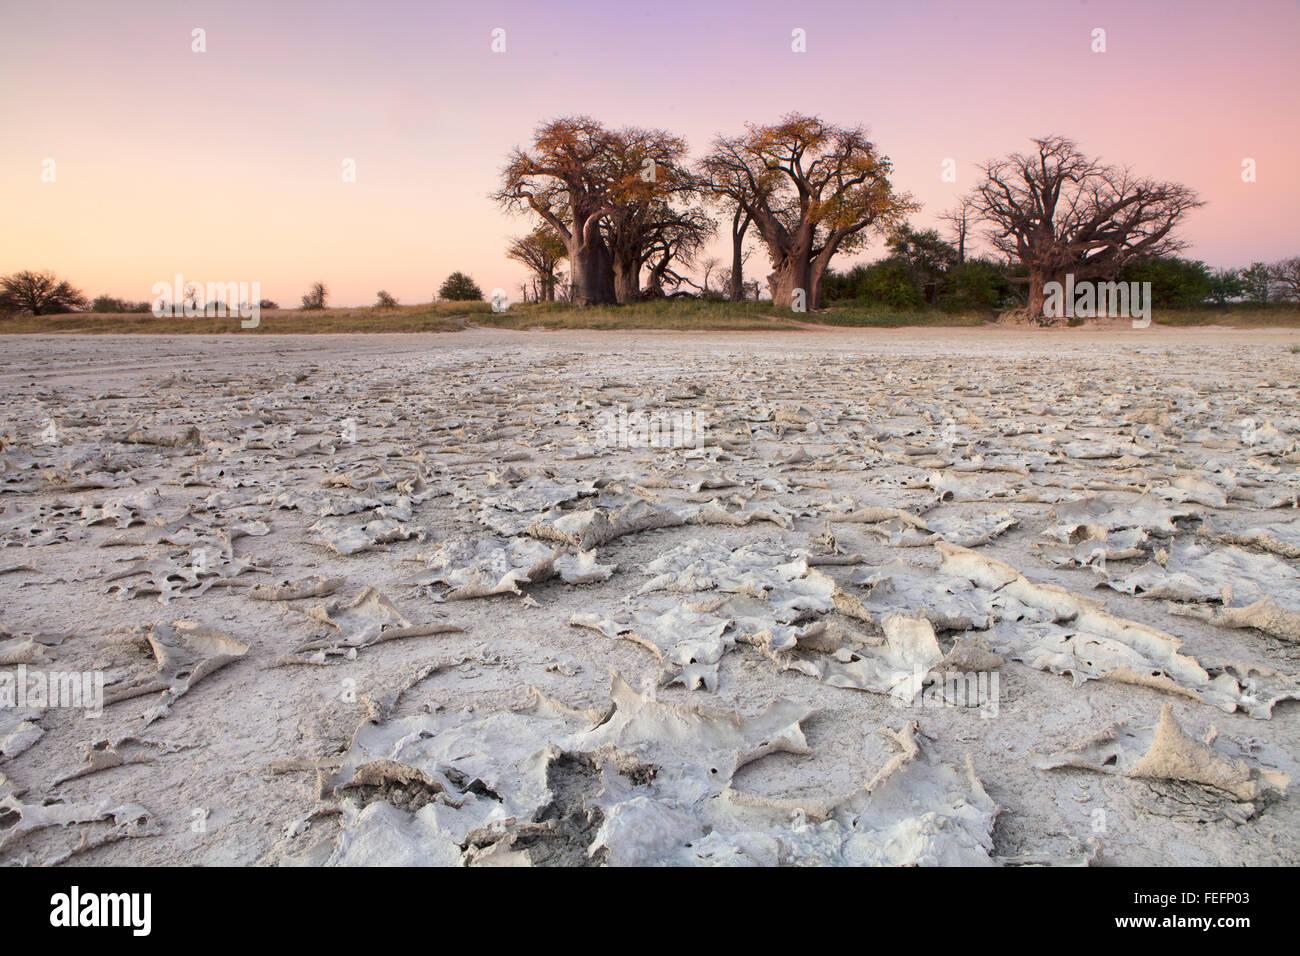 Baines Baobabs in Botswana - Stock Image